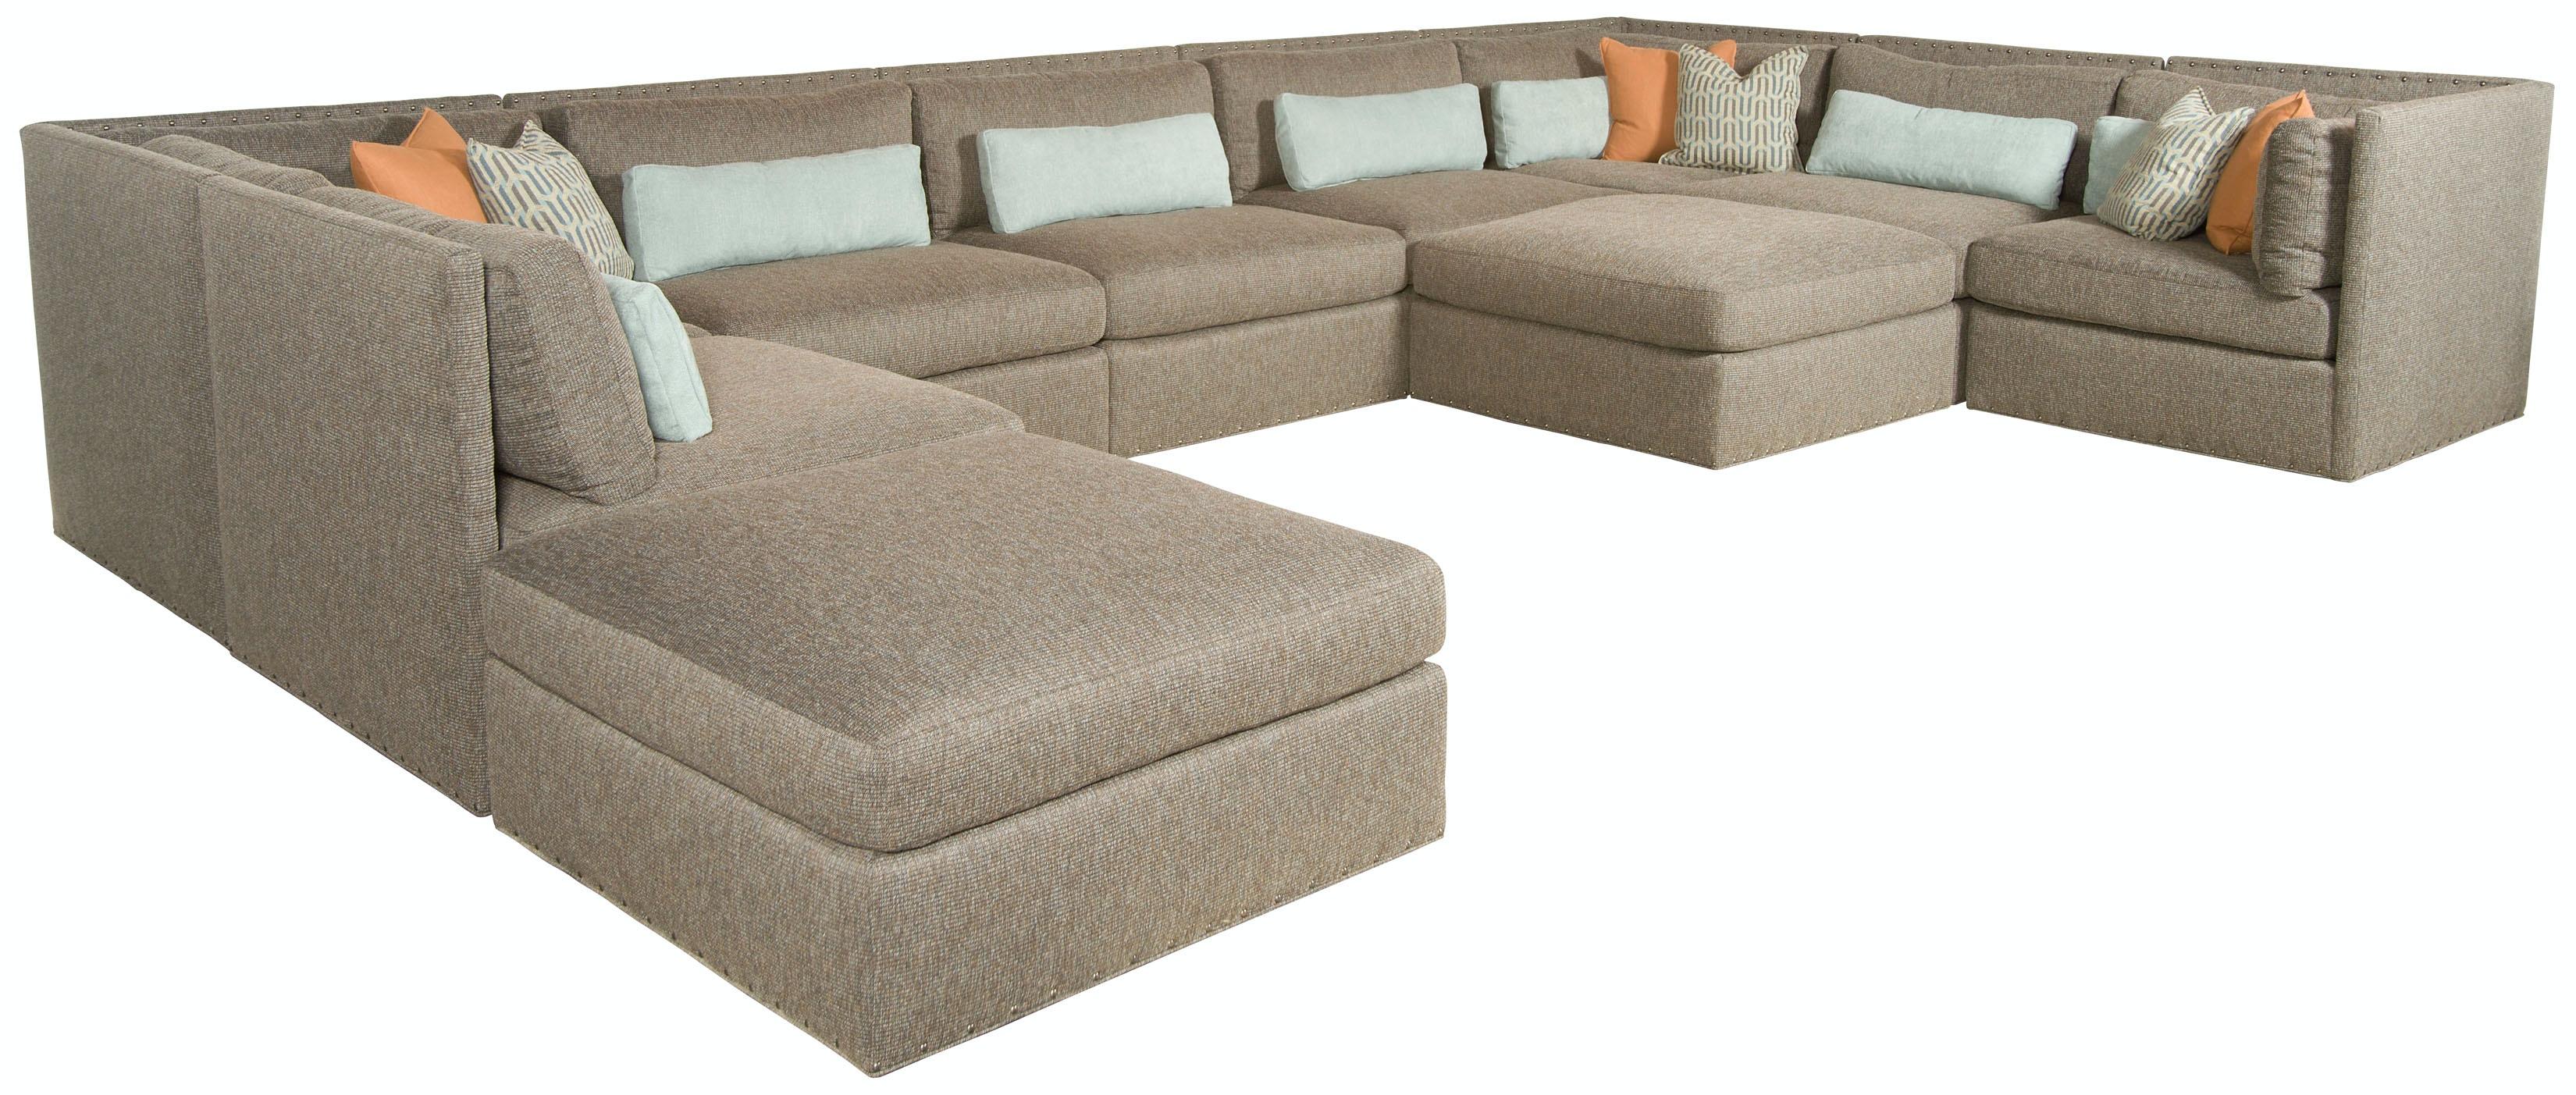 Minimalist Vanguard Steadman Armless Chair W257 AC Beautiful - Fresh Hamilton sofa and Leather Gallery Ideas